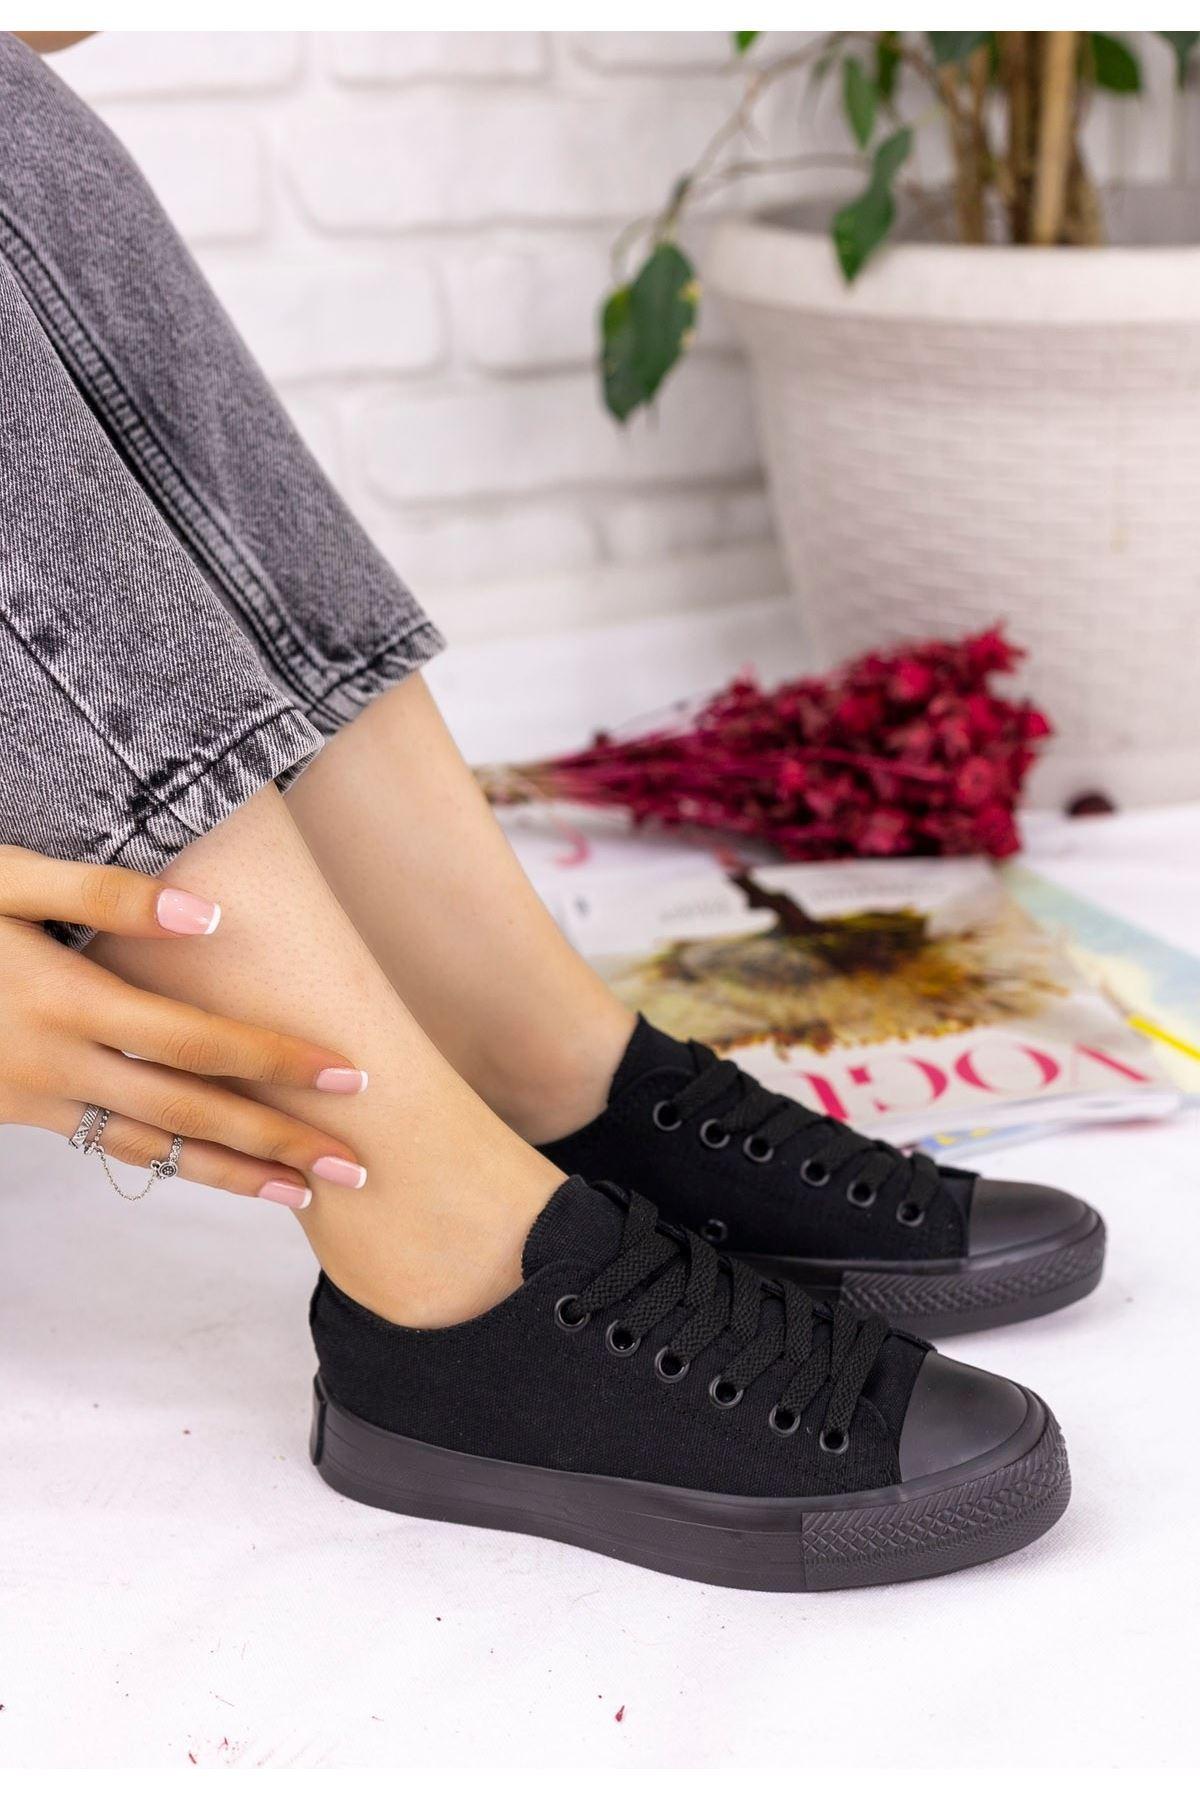 Moxi Siyah Keten Siyah Tabanlı Spor Ayakkabı